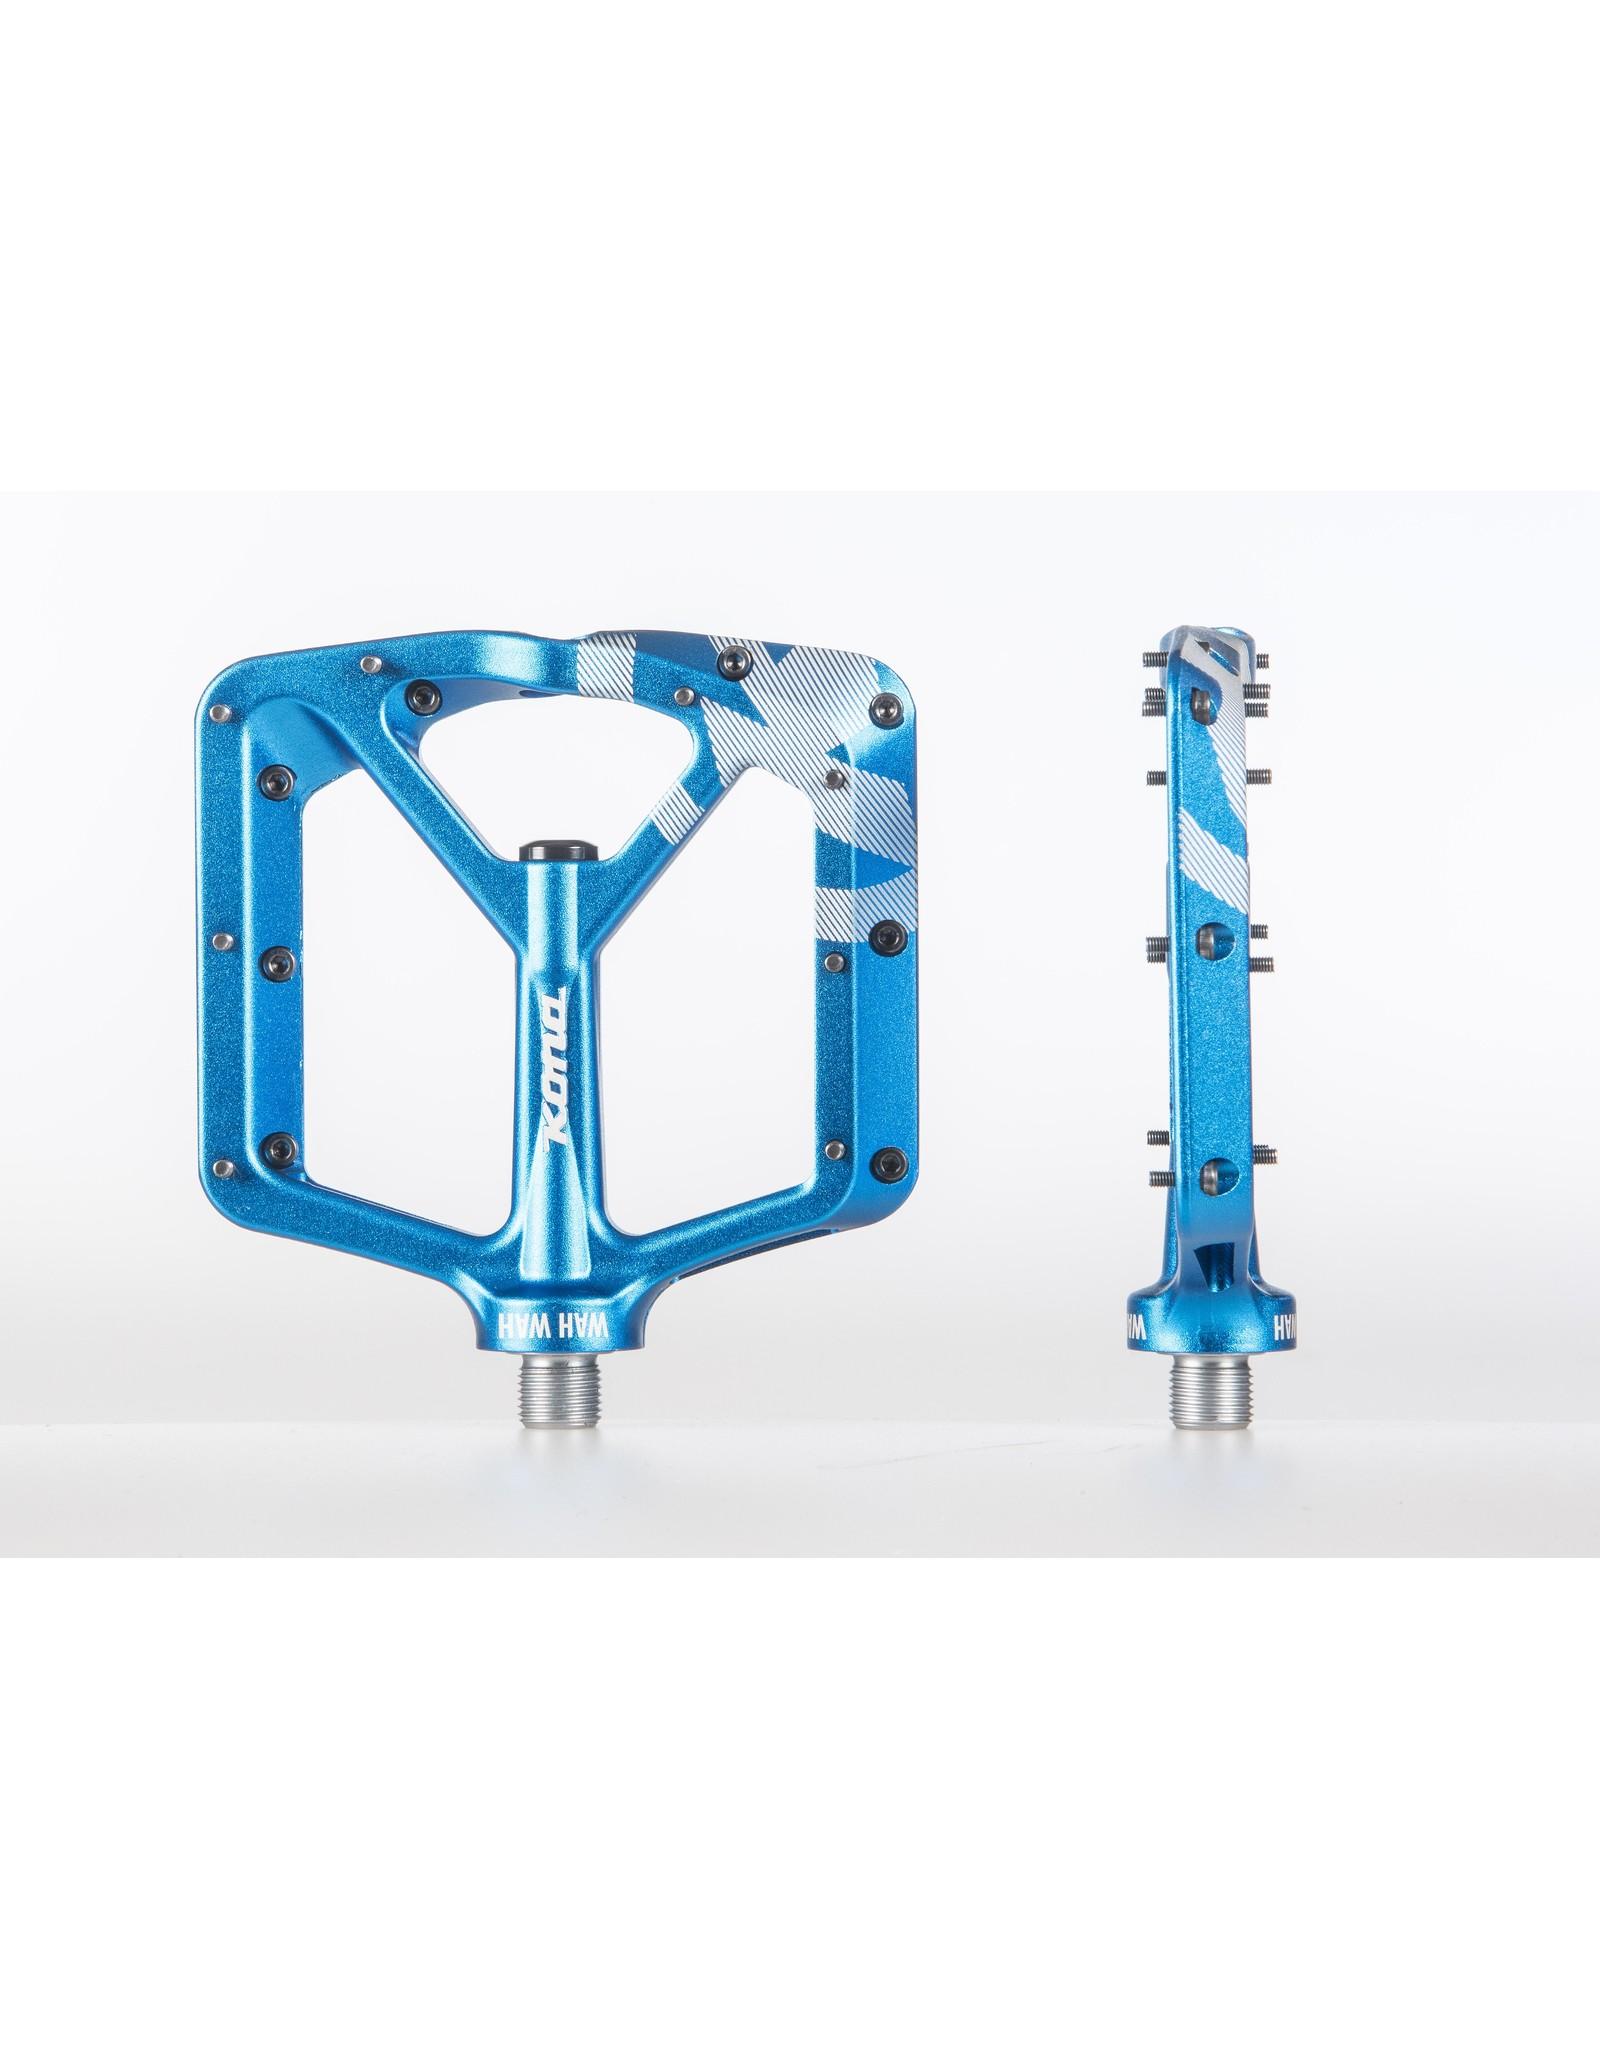 pedal kona wah wah 2 alloy bleu